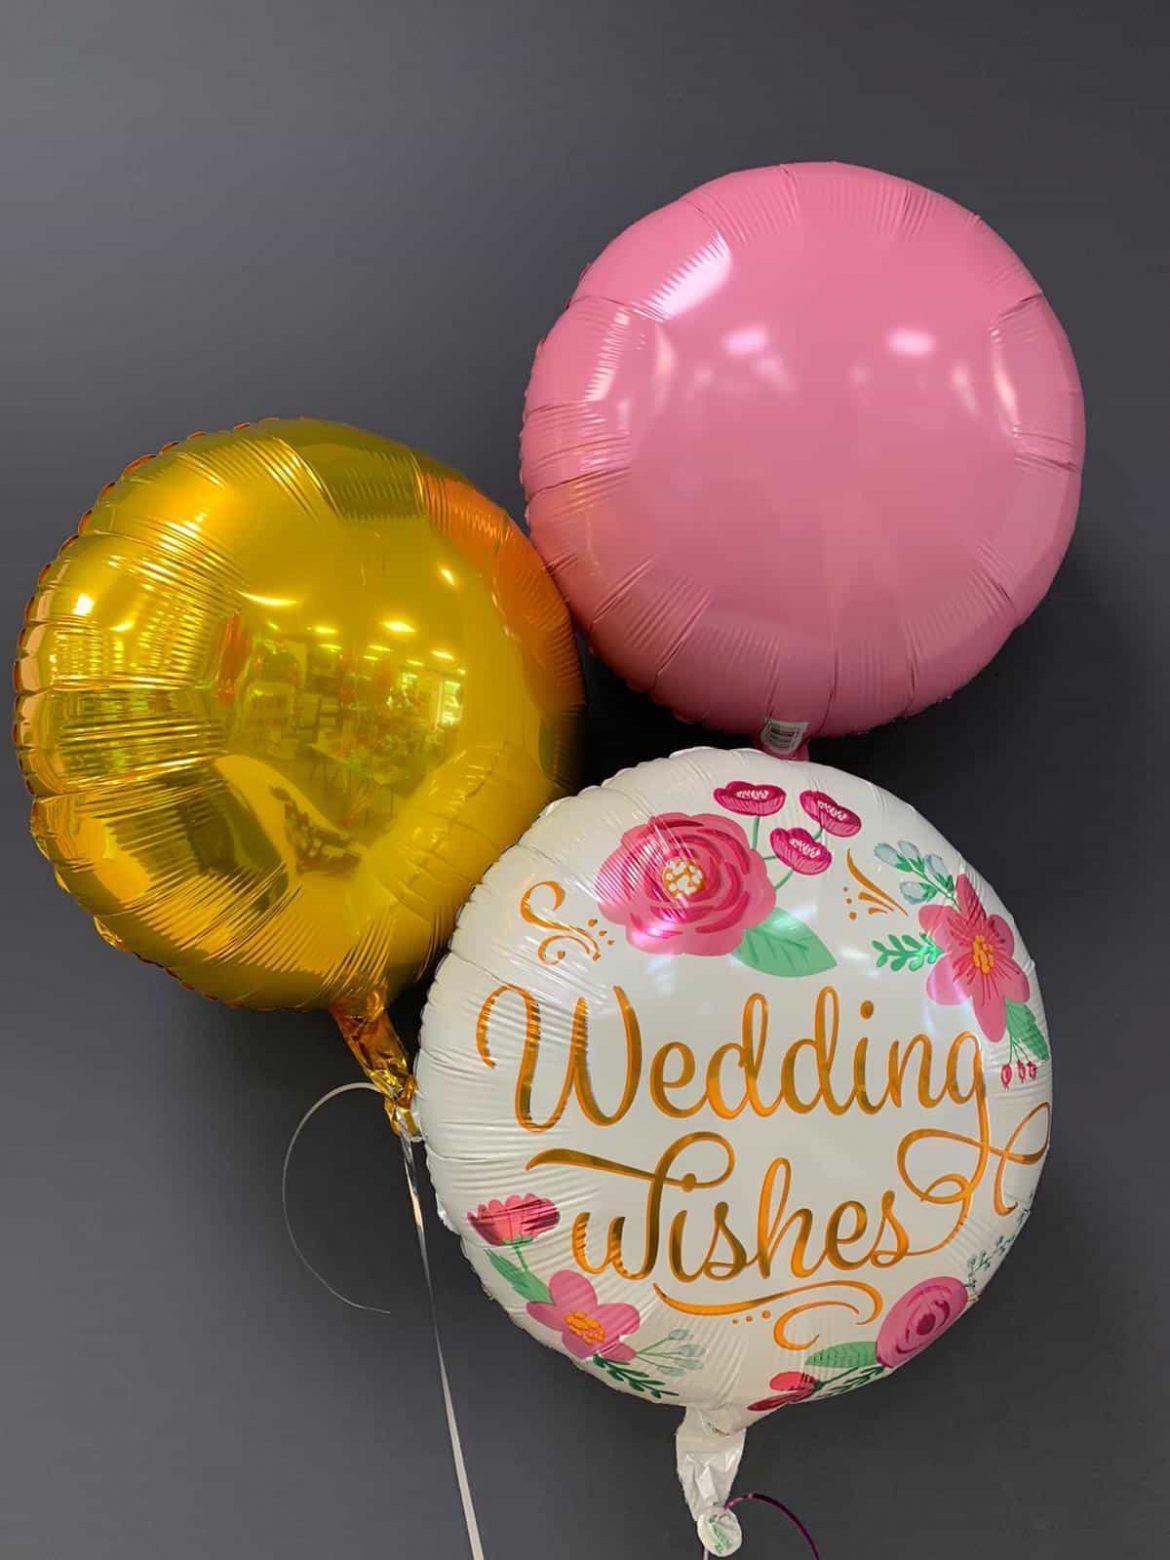 Wedding Wishes €5,50<br />Dekoballons €4,50 1